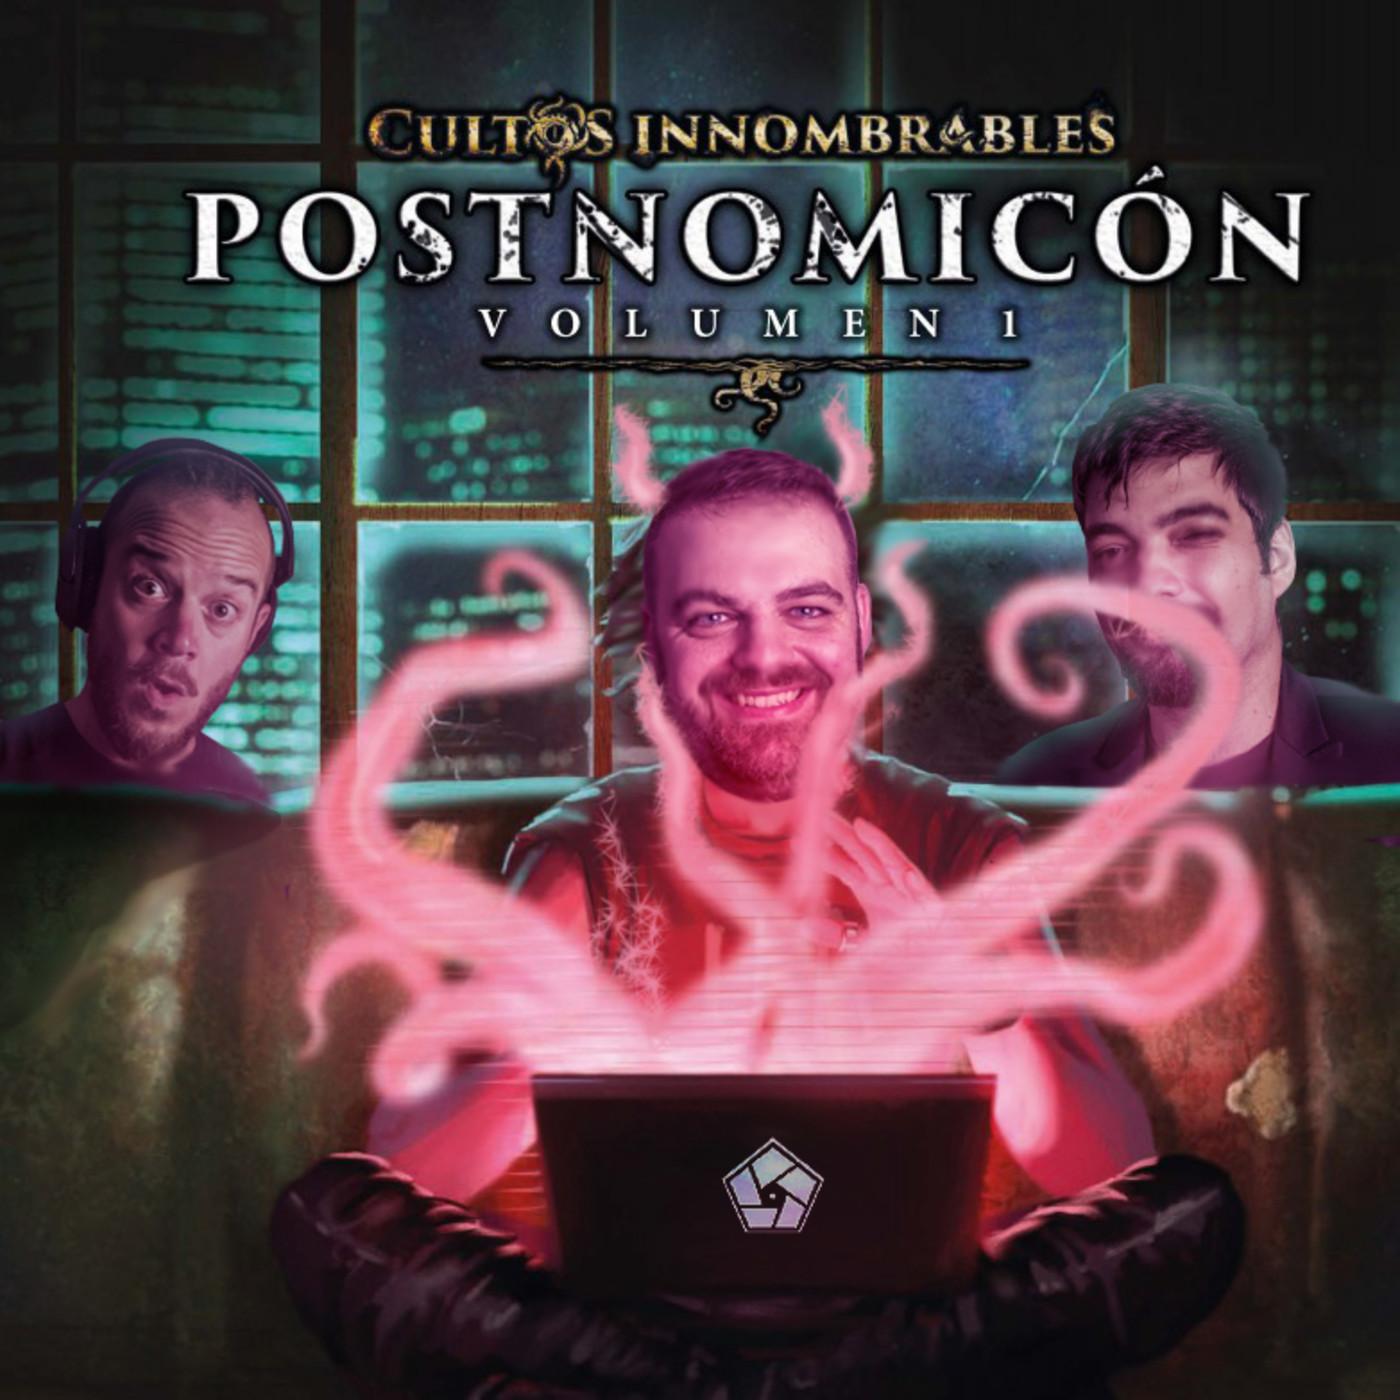 Cap.123 Postnomicon Vol1 4-12-17